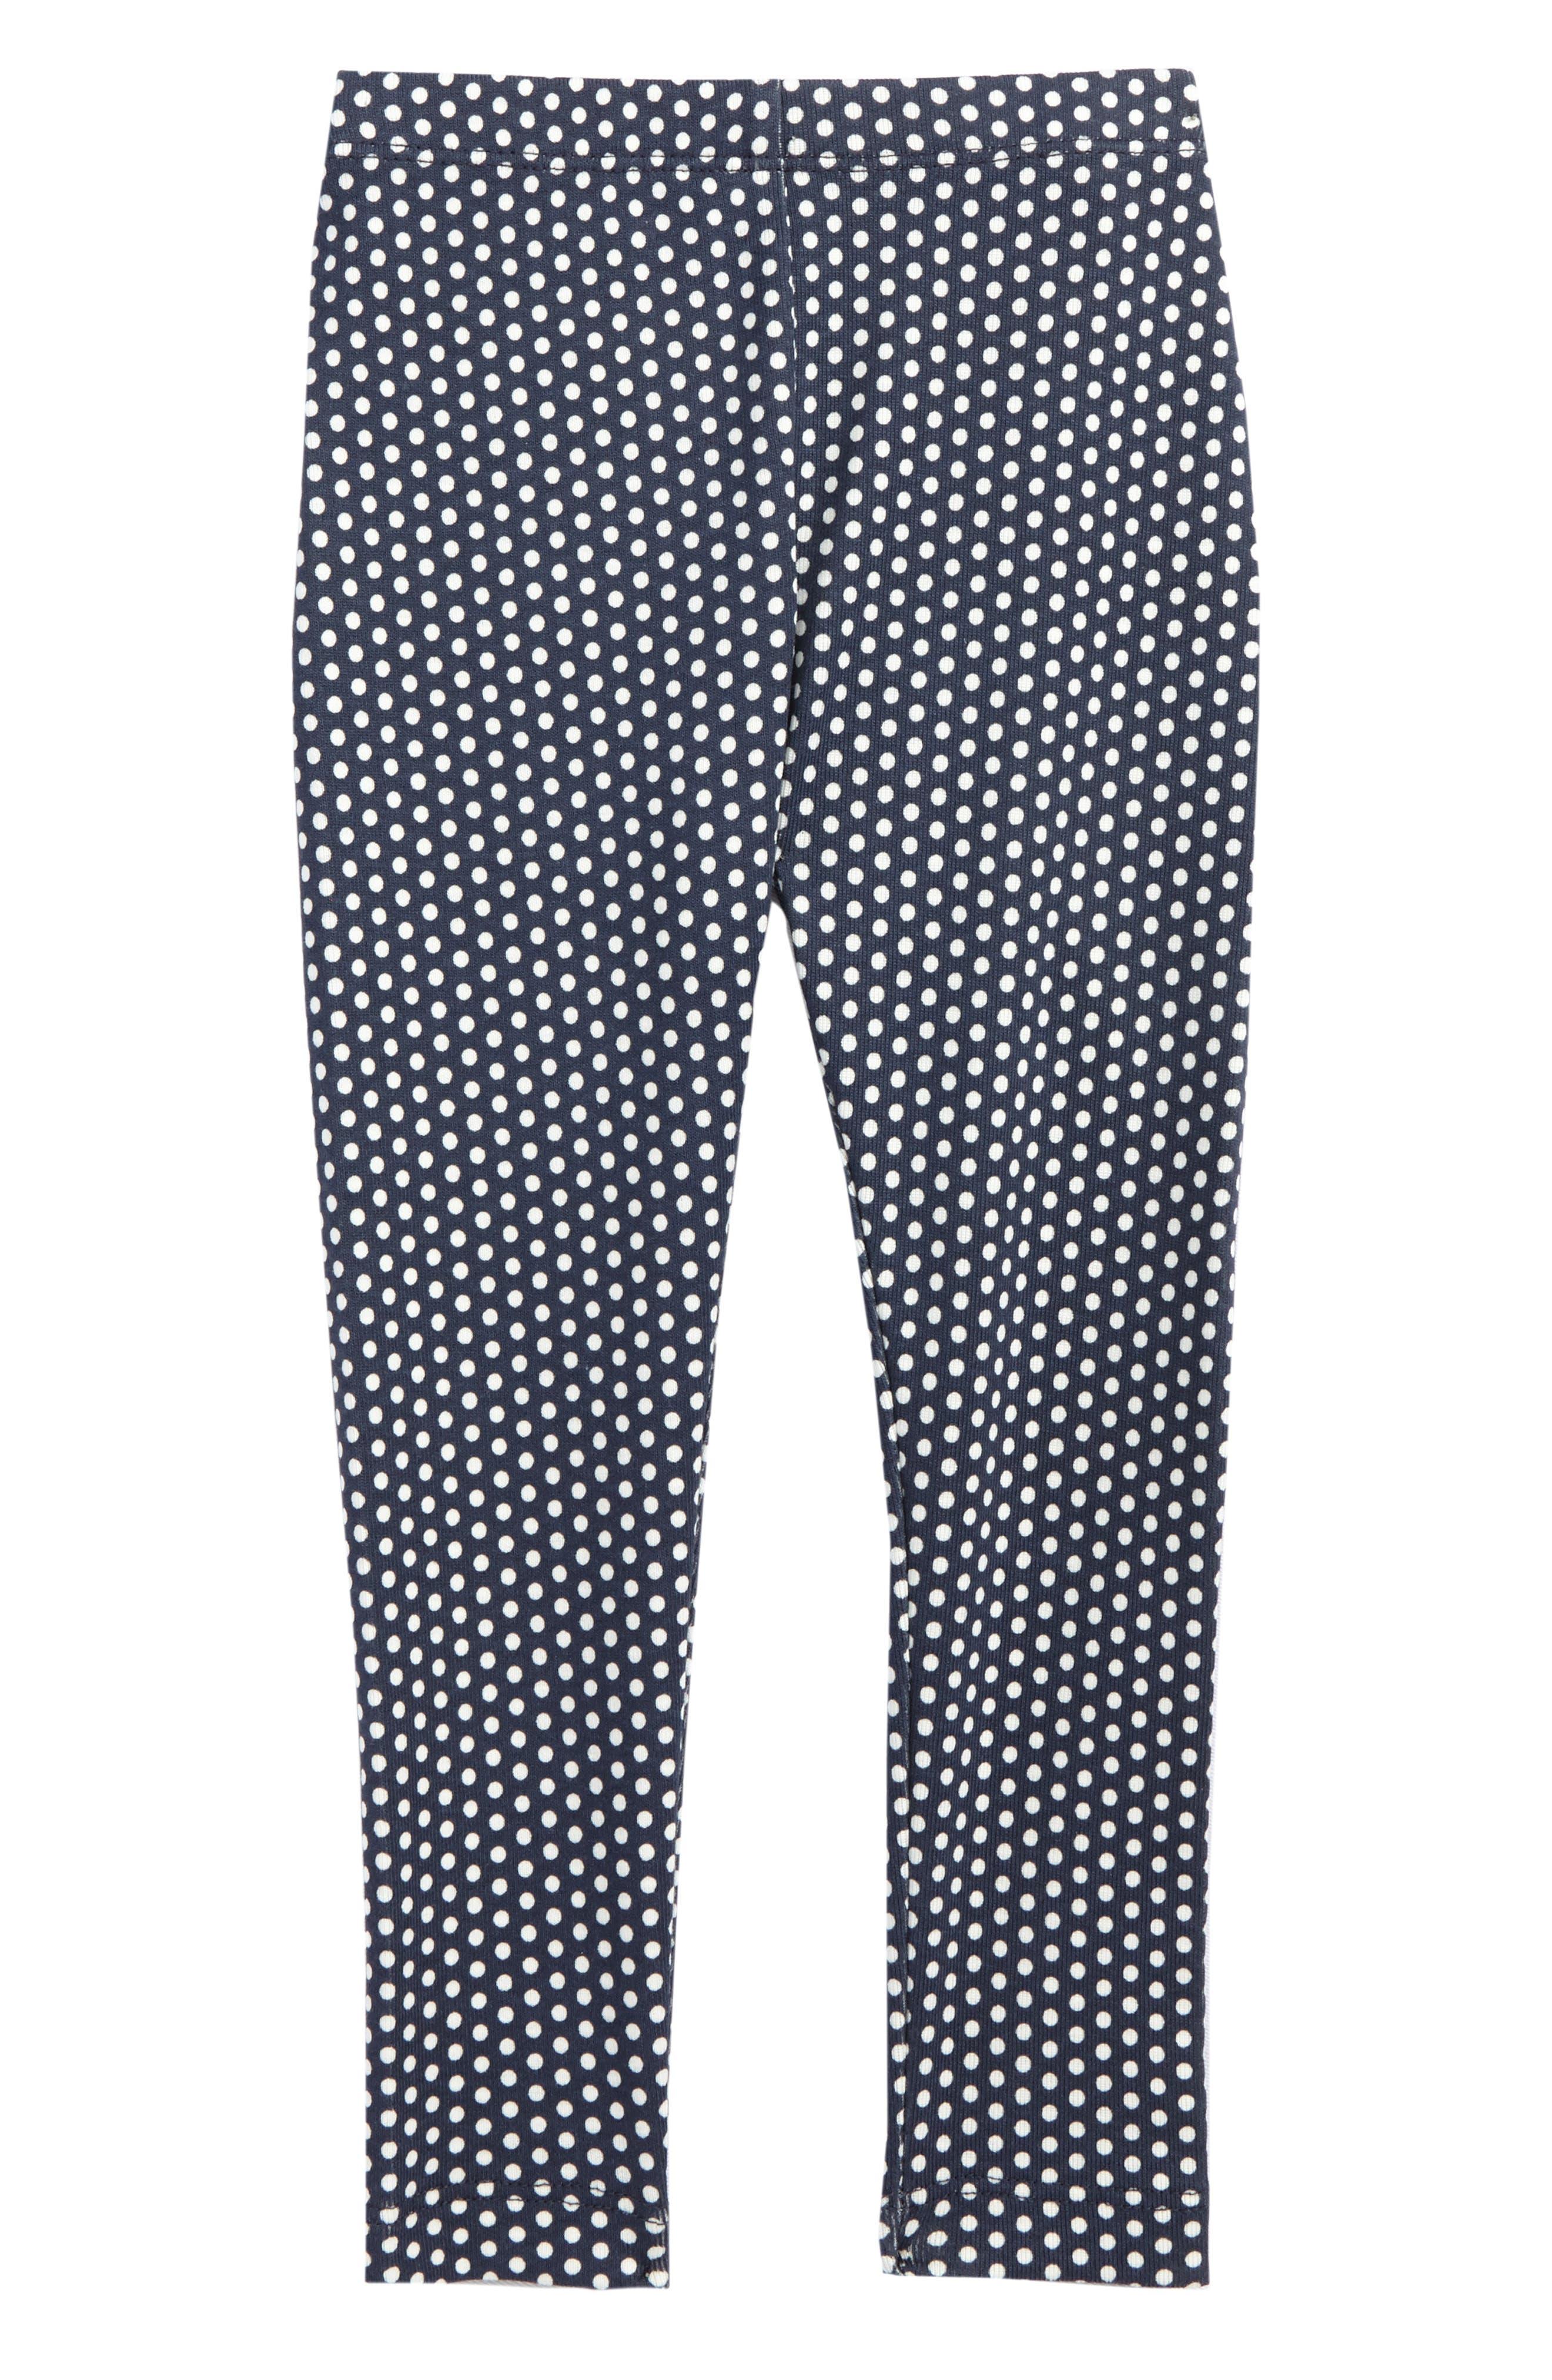 Polka Dot Leggings,                         Main,                         color, 411